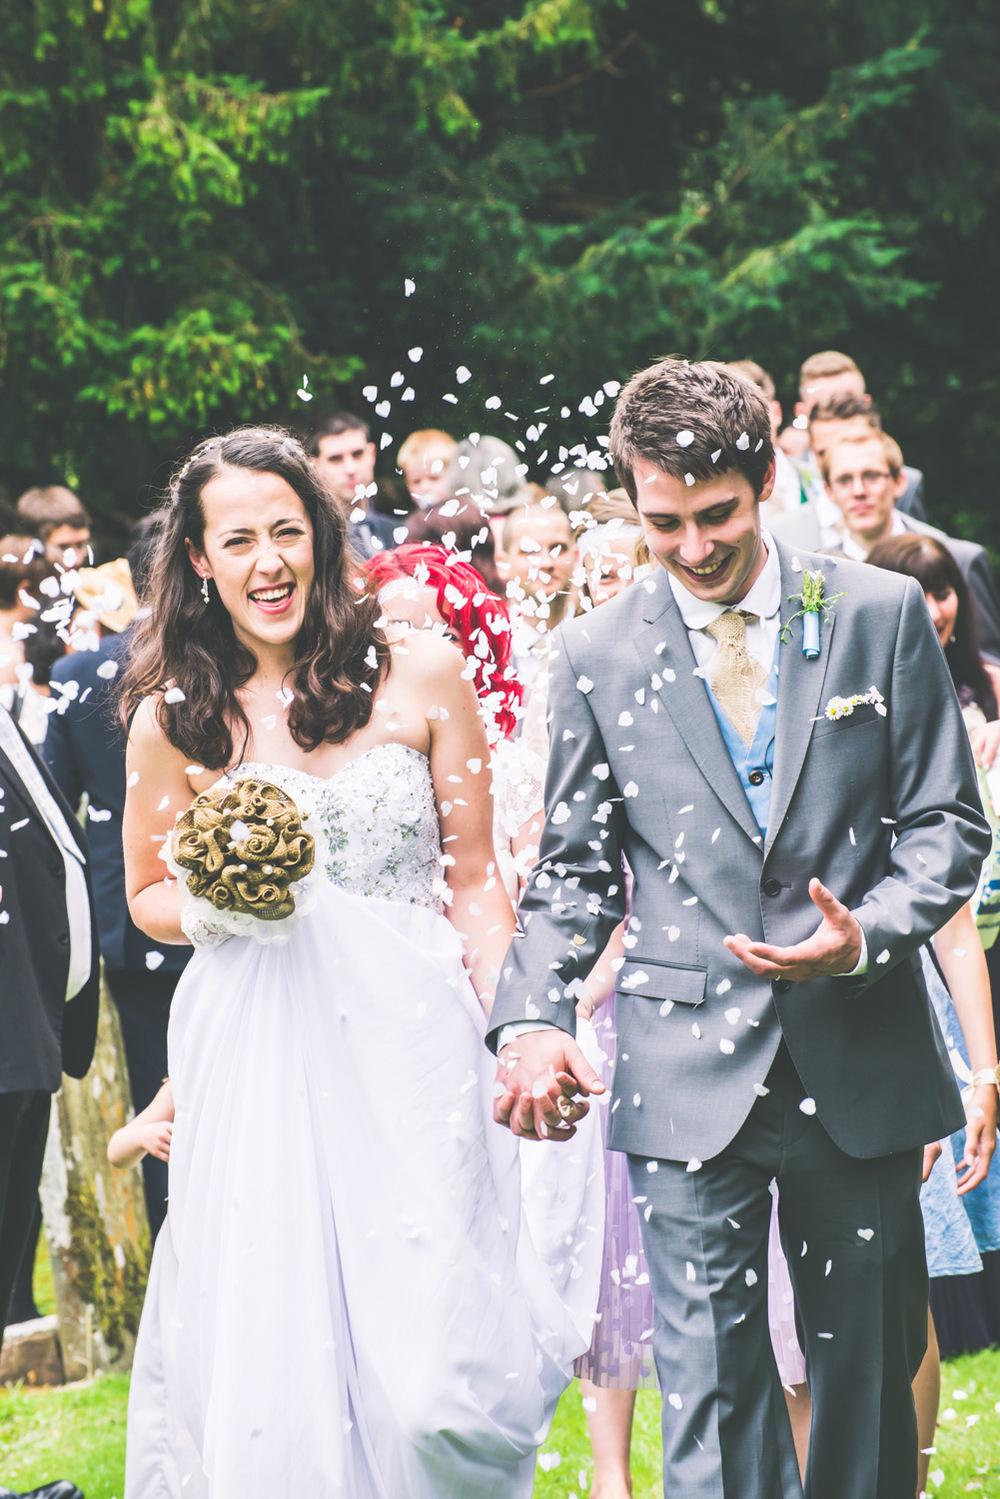 Creative Wedding Photogrpahy Cardiff South Wales christopherpaulweddings.com-38.jpg